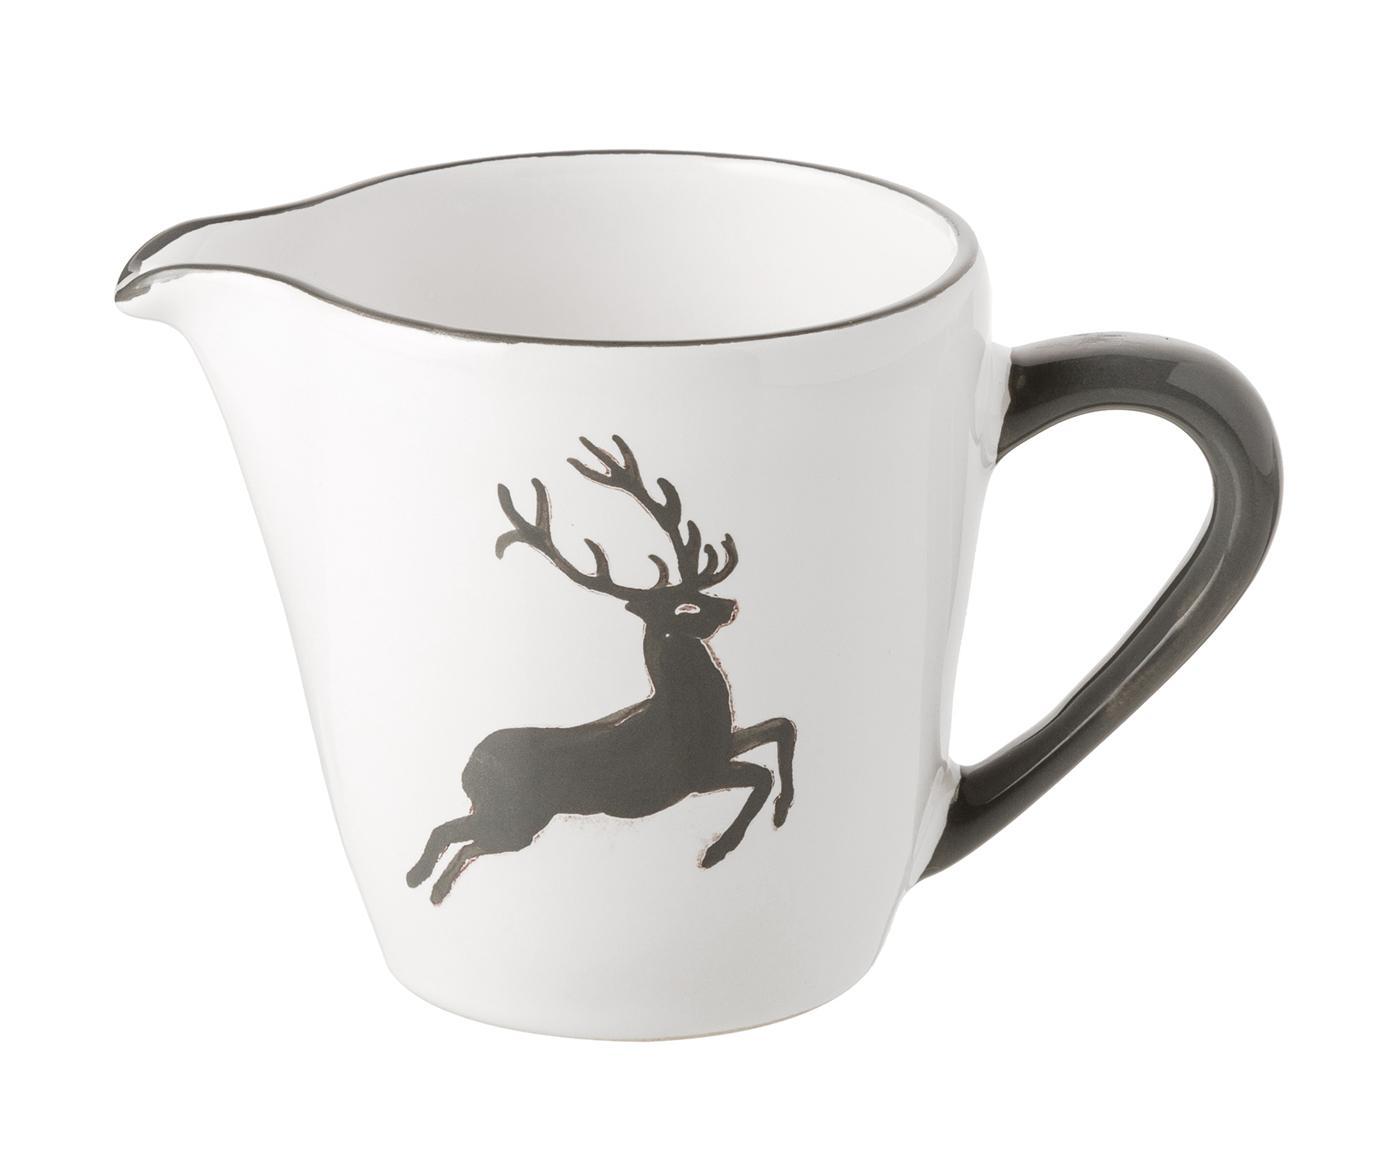 Lattiera Gourmet Grauer Hirsch, Ceramica, Grigio, bianco, 200 ml